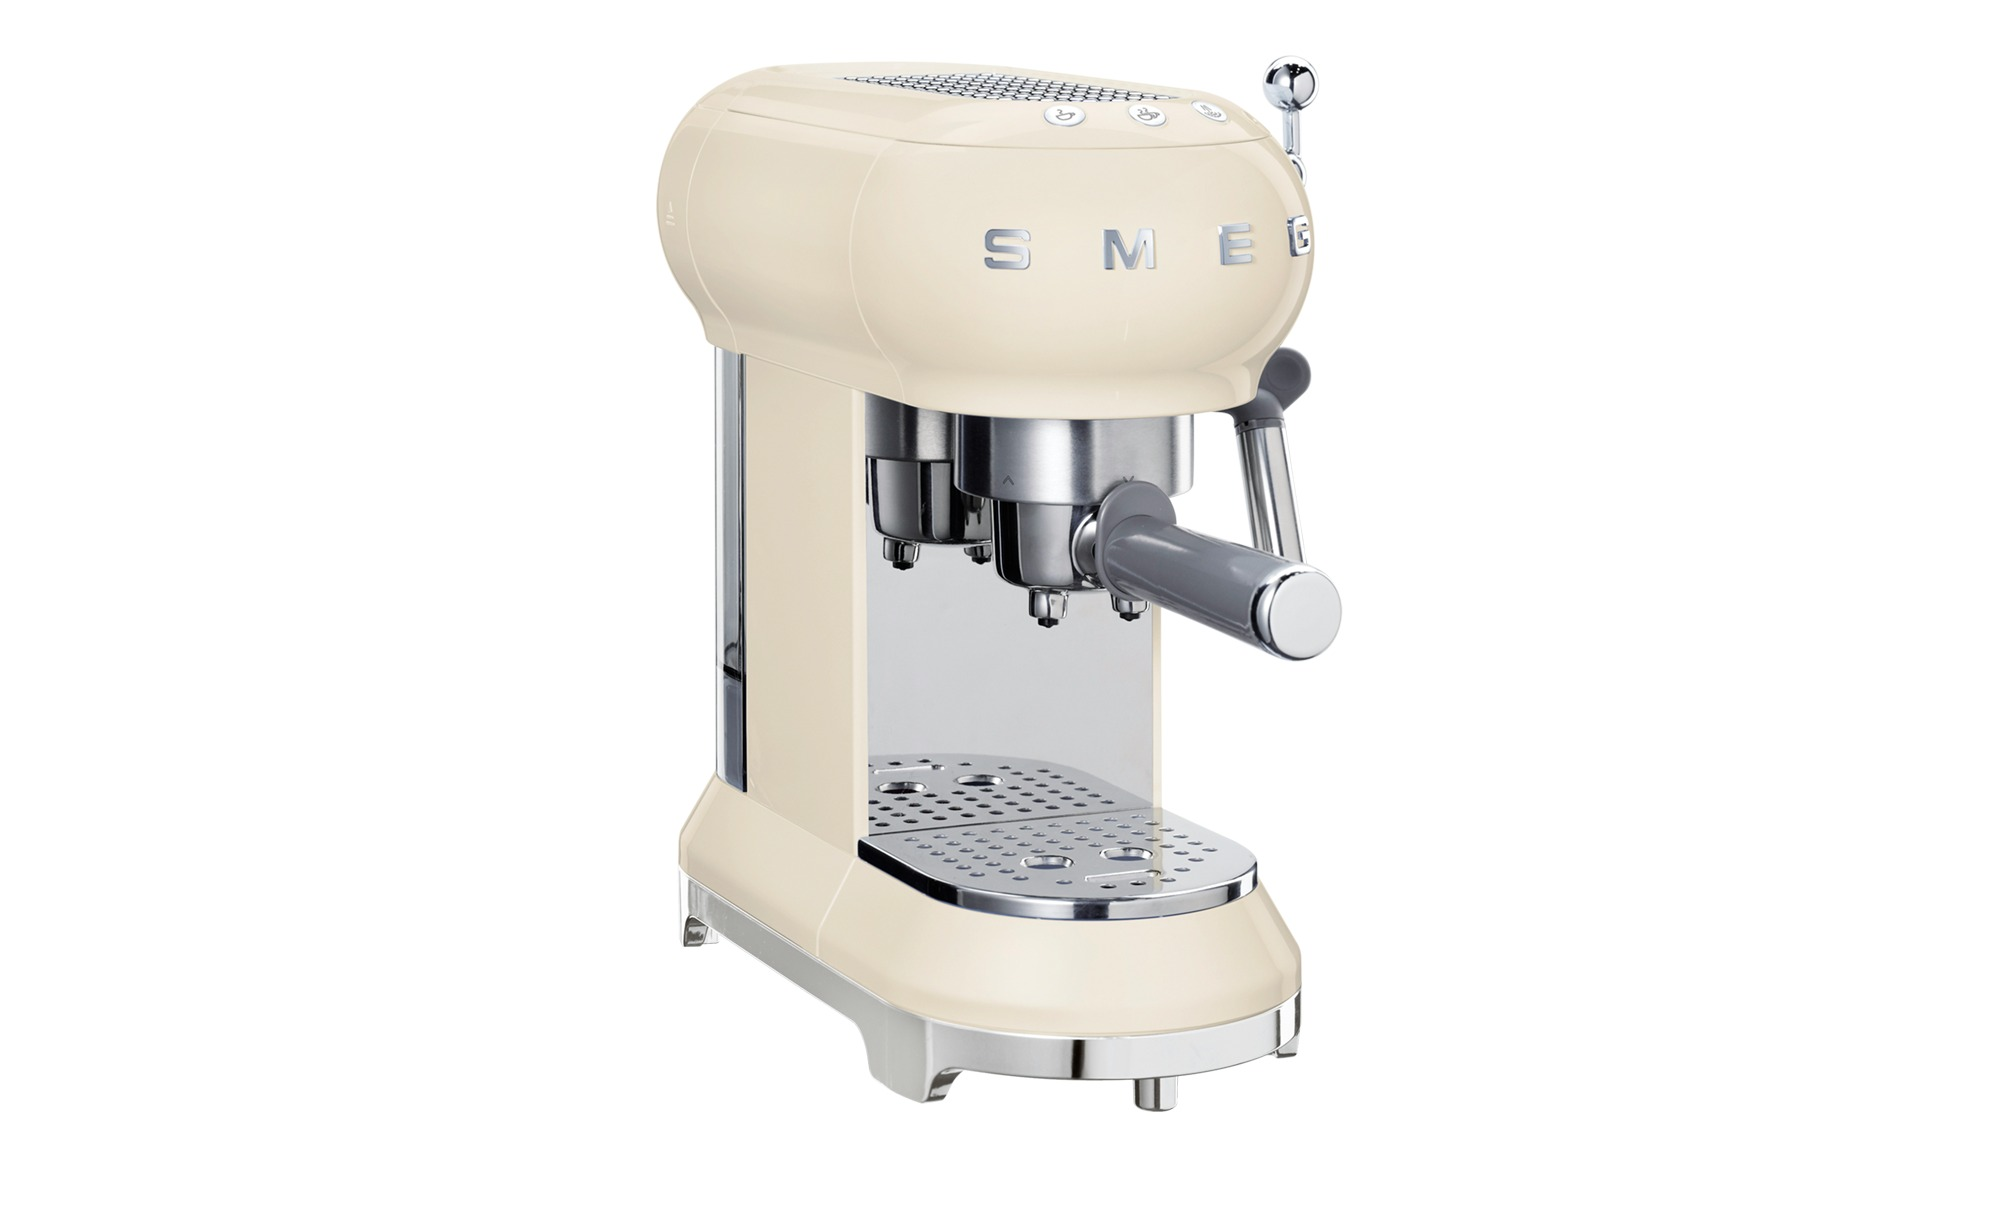 smeg Espresso-Maschine  ECF01CREU ¦ creme ¦ Metall| Edelstahl| Kunststoff ¦ Maße (cm): B: 14|9 H: 30|3 T: 33 Elektrokleingeräte > Kaffee & Espressomaschinen - Höffner | Küche und Esszimmer > Kaffee und Tee > Espressomaschinen | Möbel Höffner DE